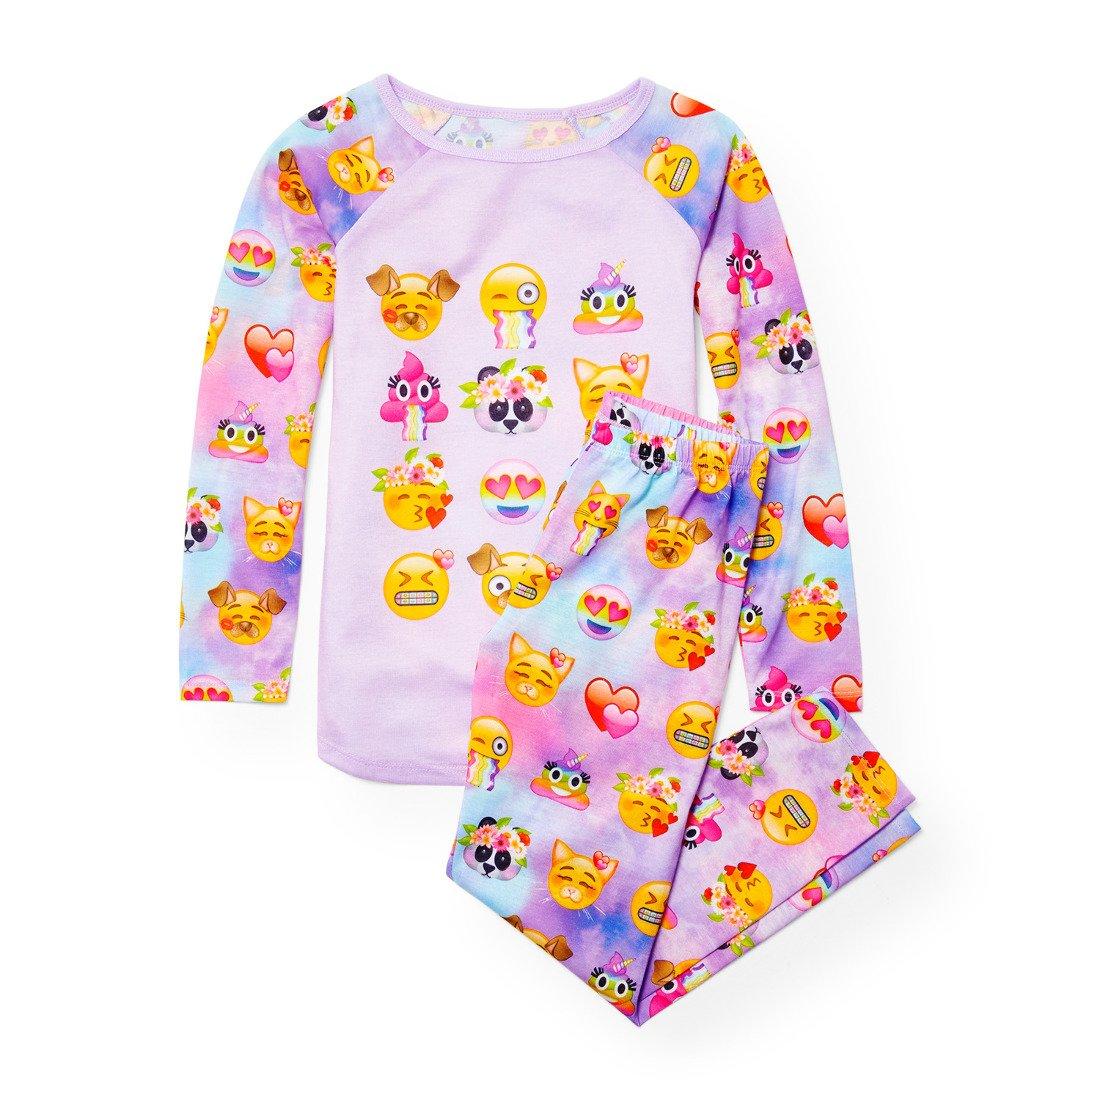 The Children's Place Big Girls' Emoji Face 2 Piece Pajamas, Palestpurp 91403, M (7/8)